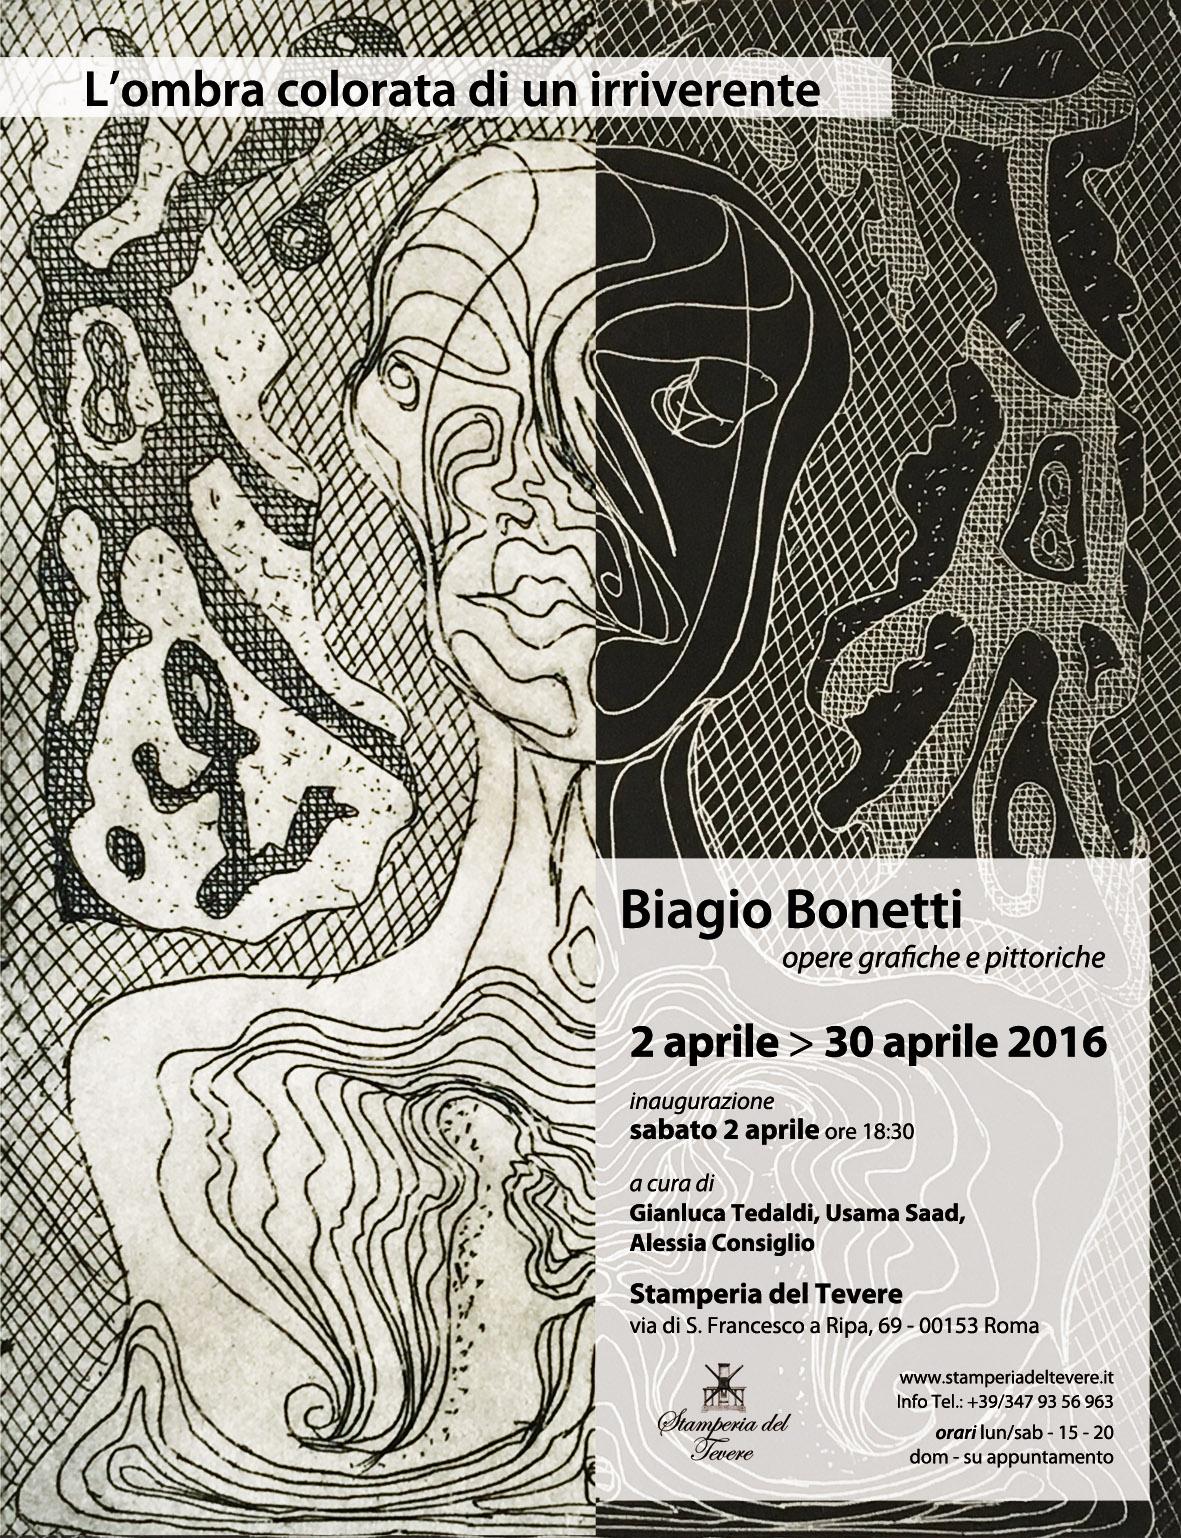 Biagio Bonetti